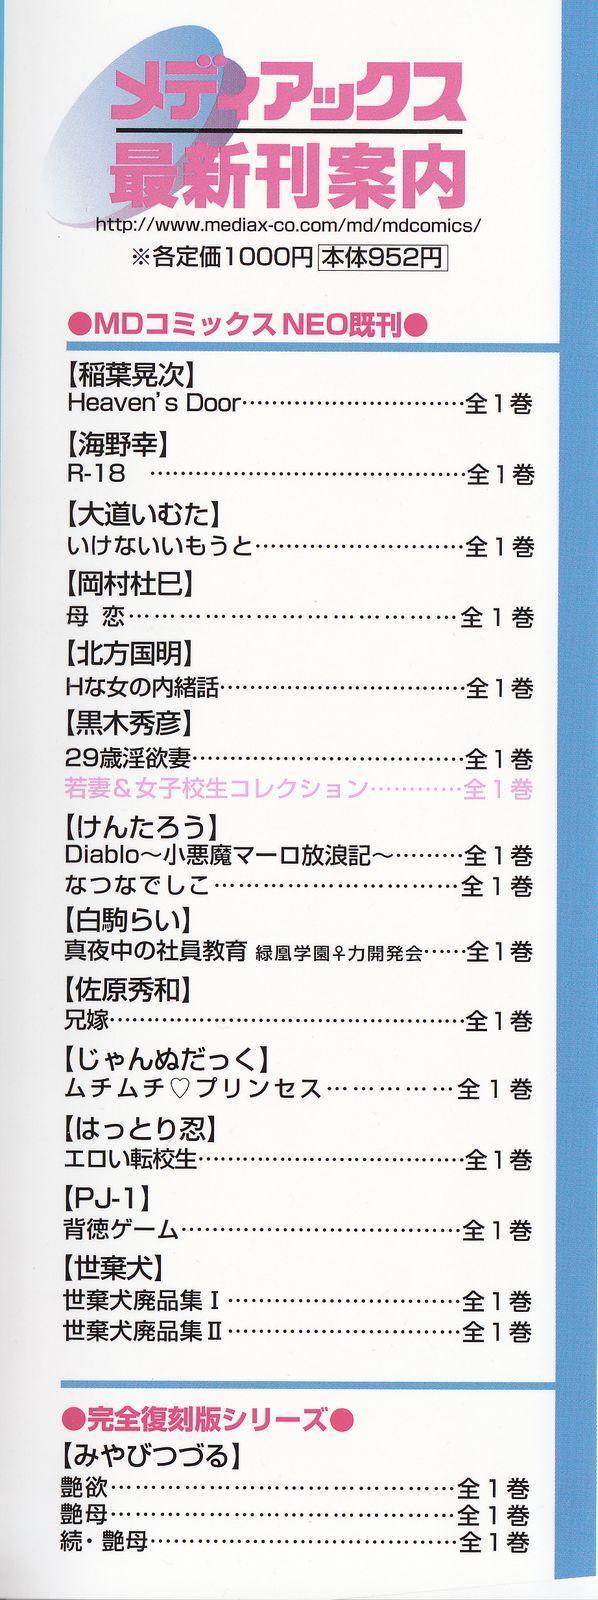 Jukubo Yuugi - Itoshii Hito Chapter 1 + 2 + 3 2